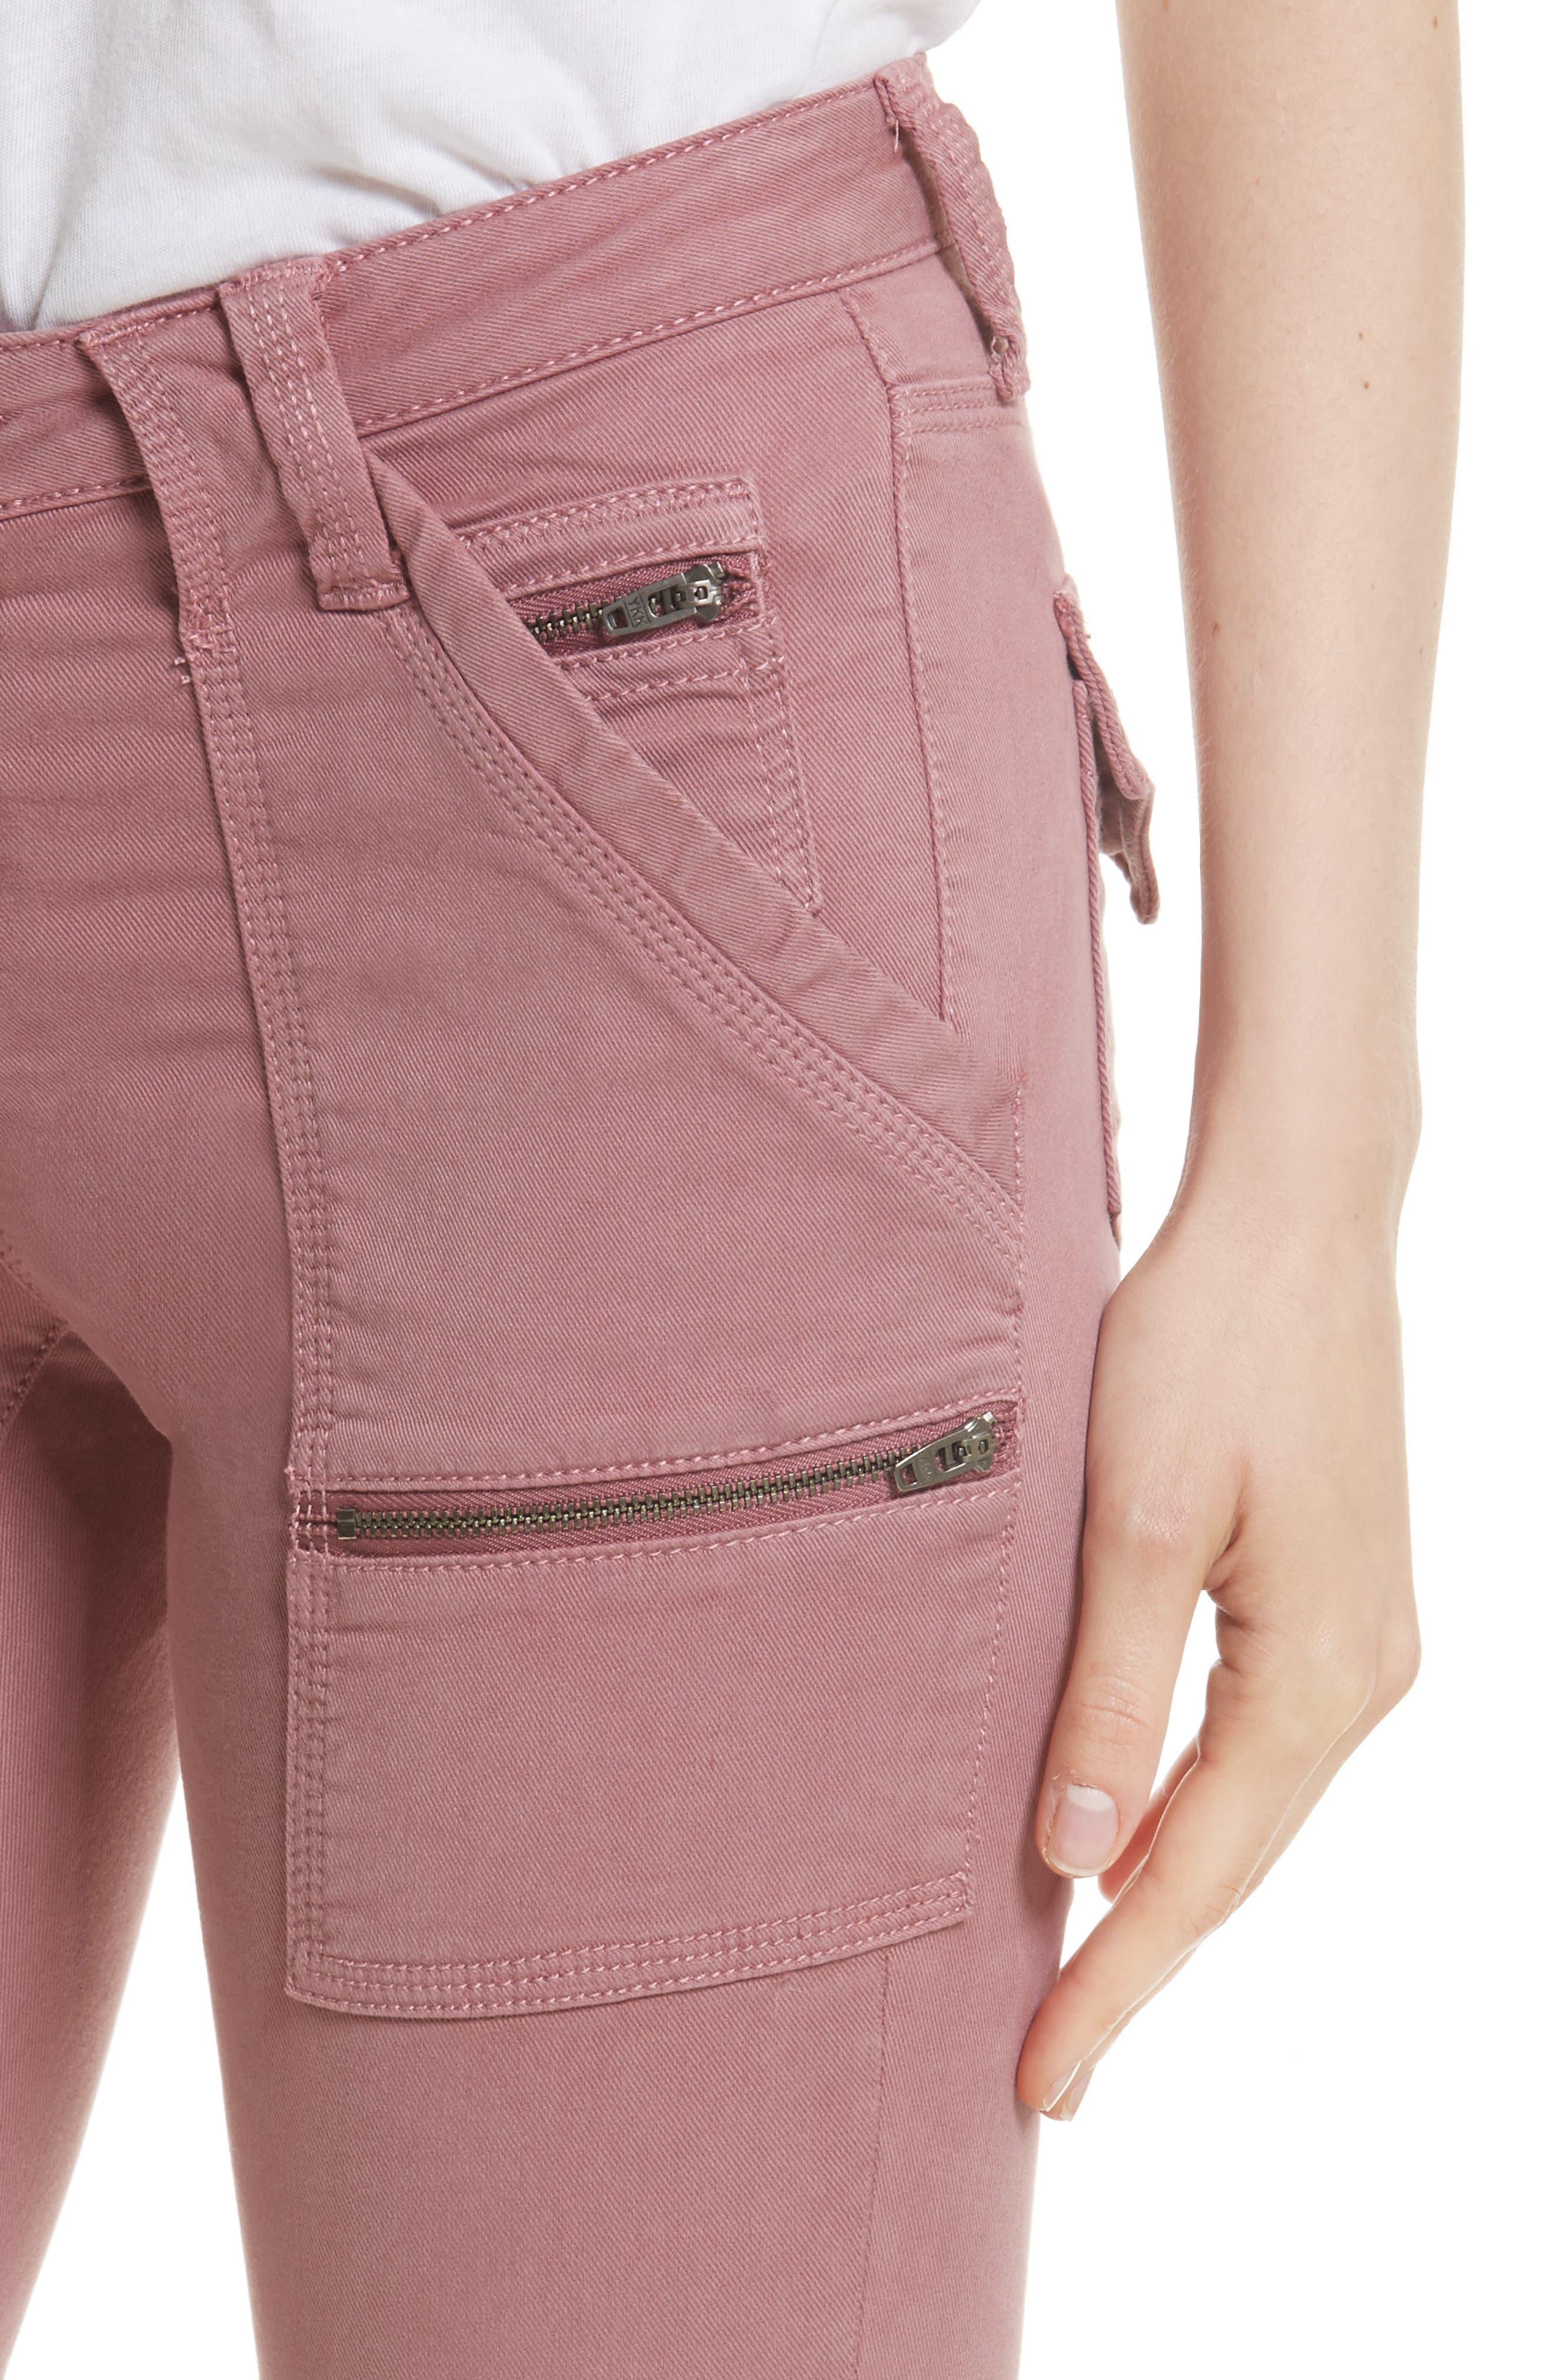 Park Skinny Pants,                             Alternate thumbnail 36, color,